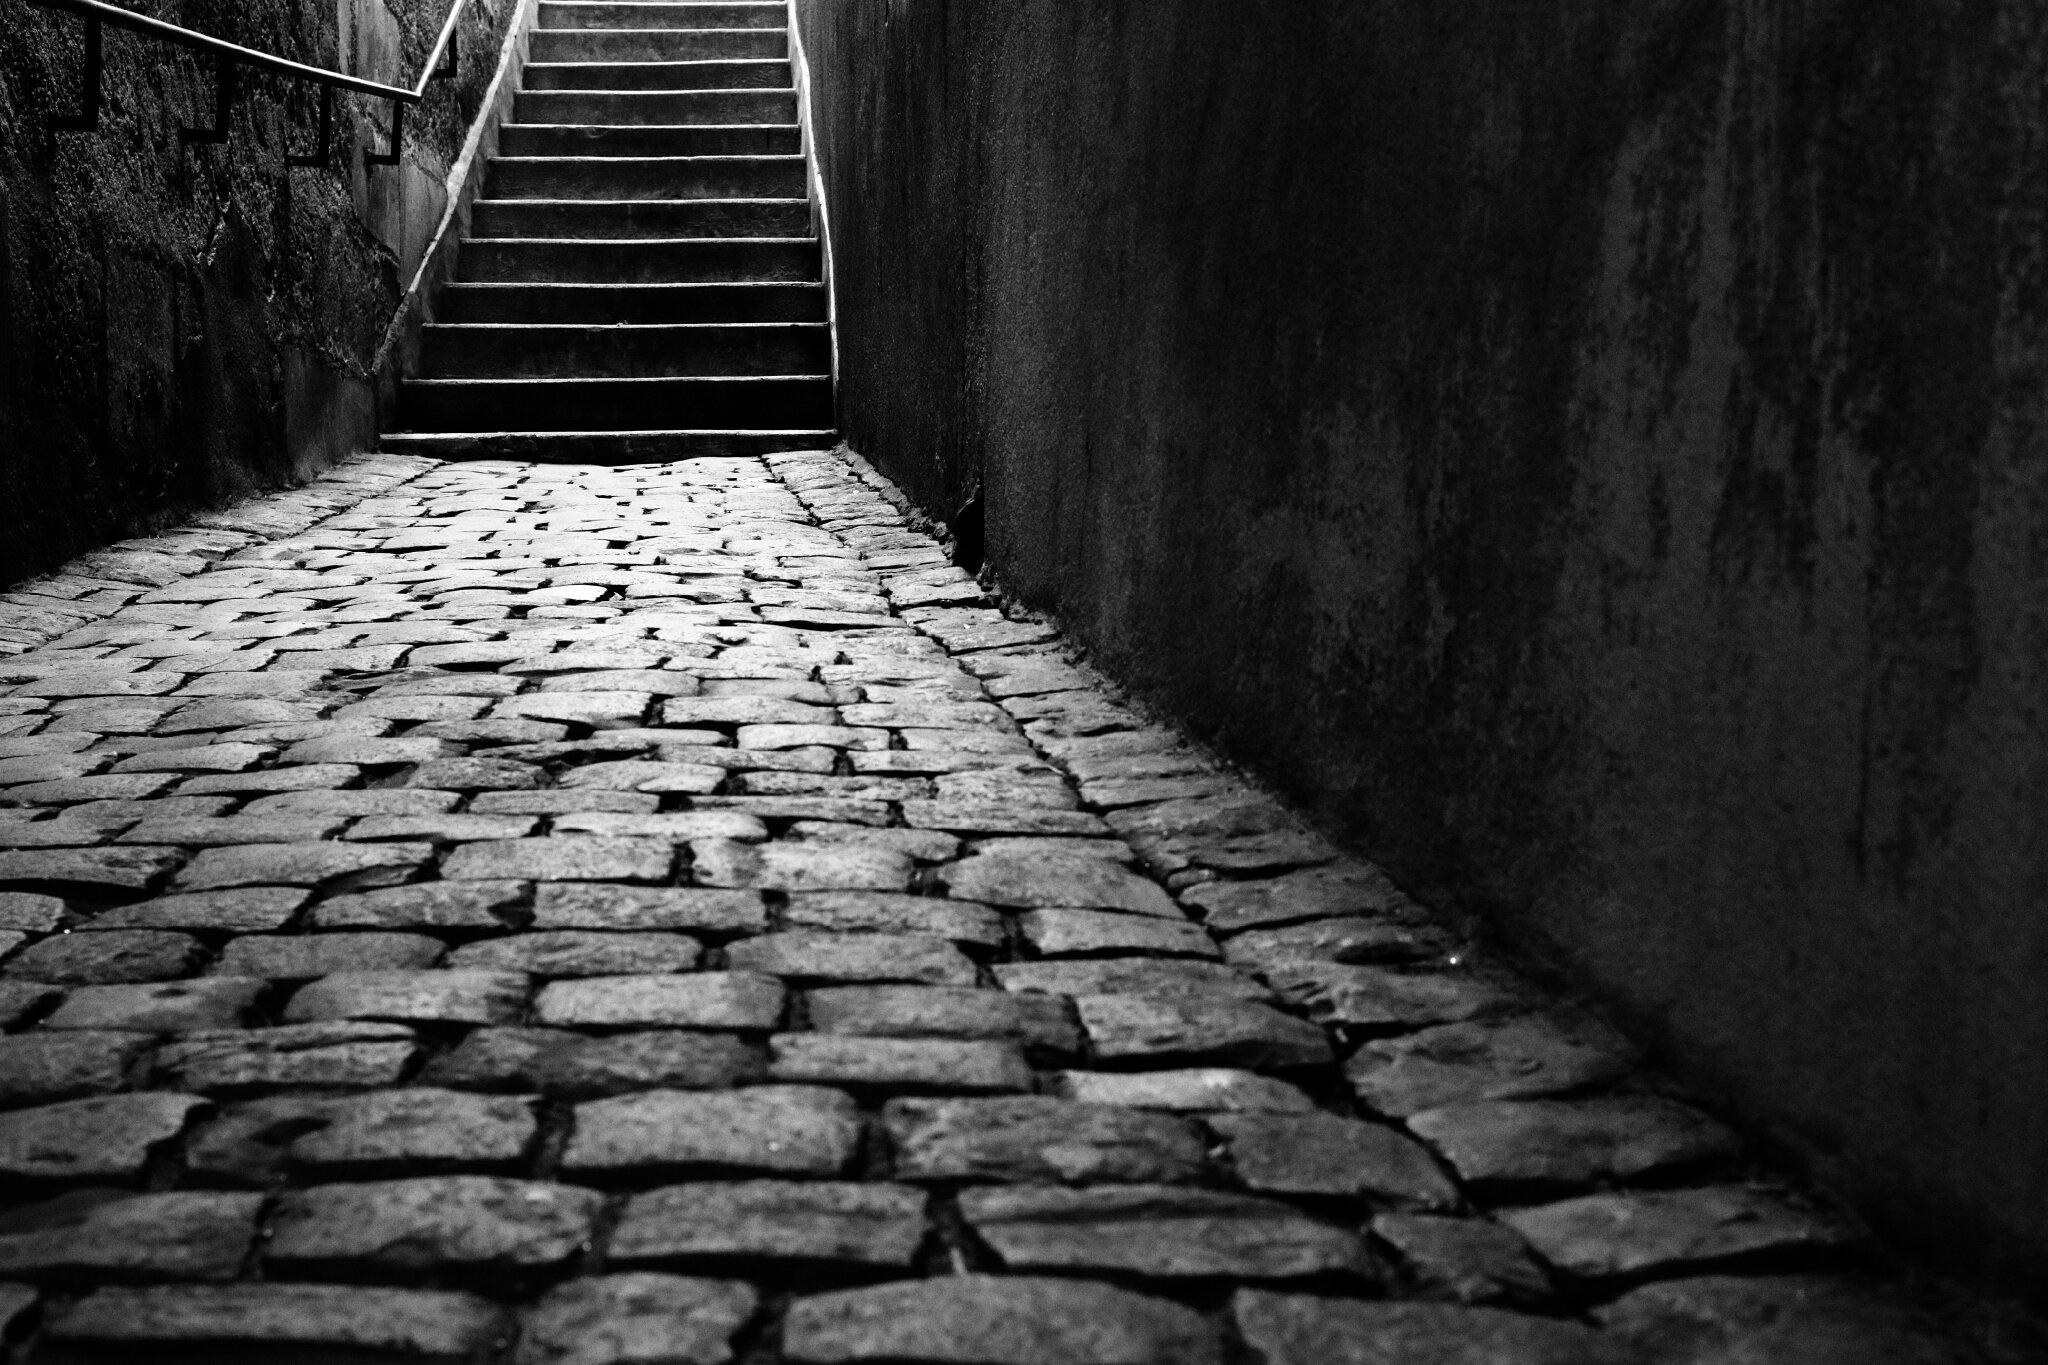 Escalier_Mirebeau